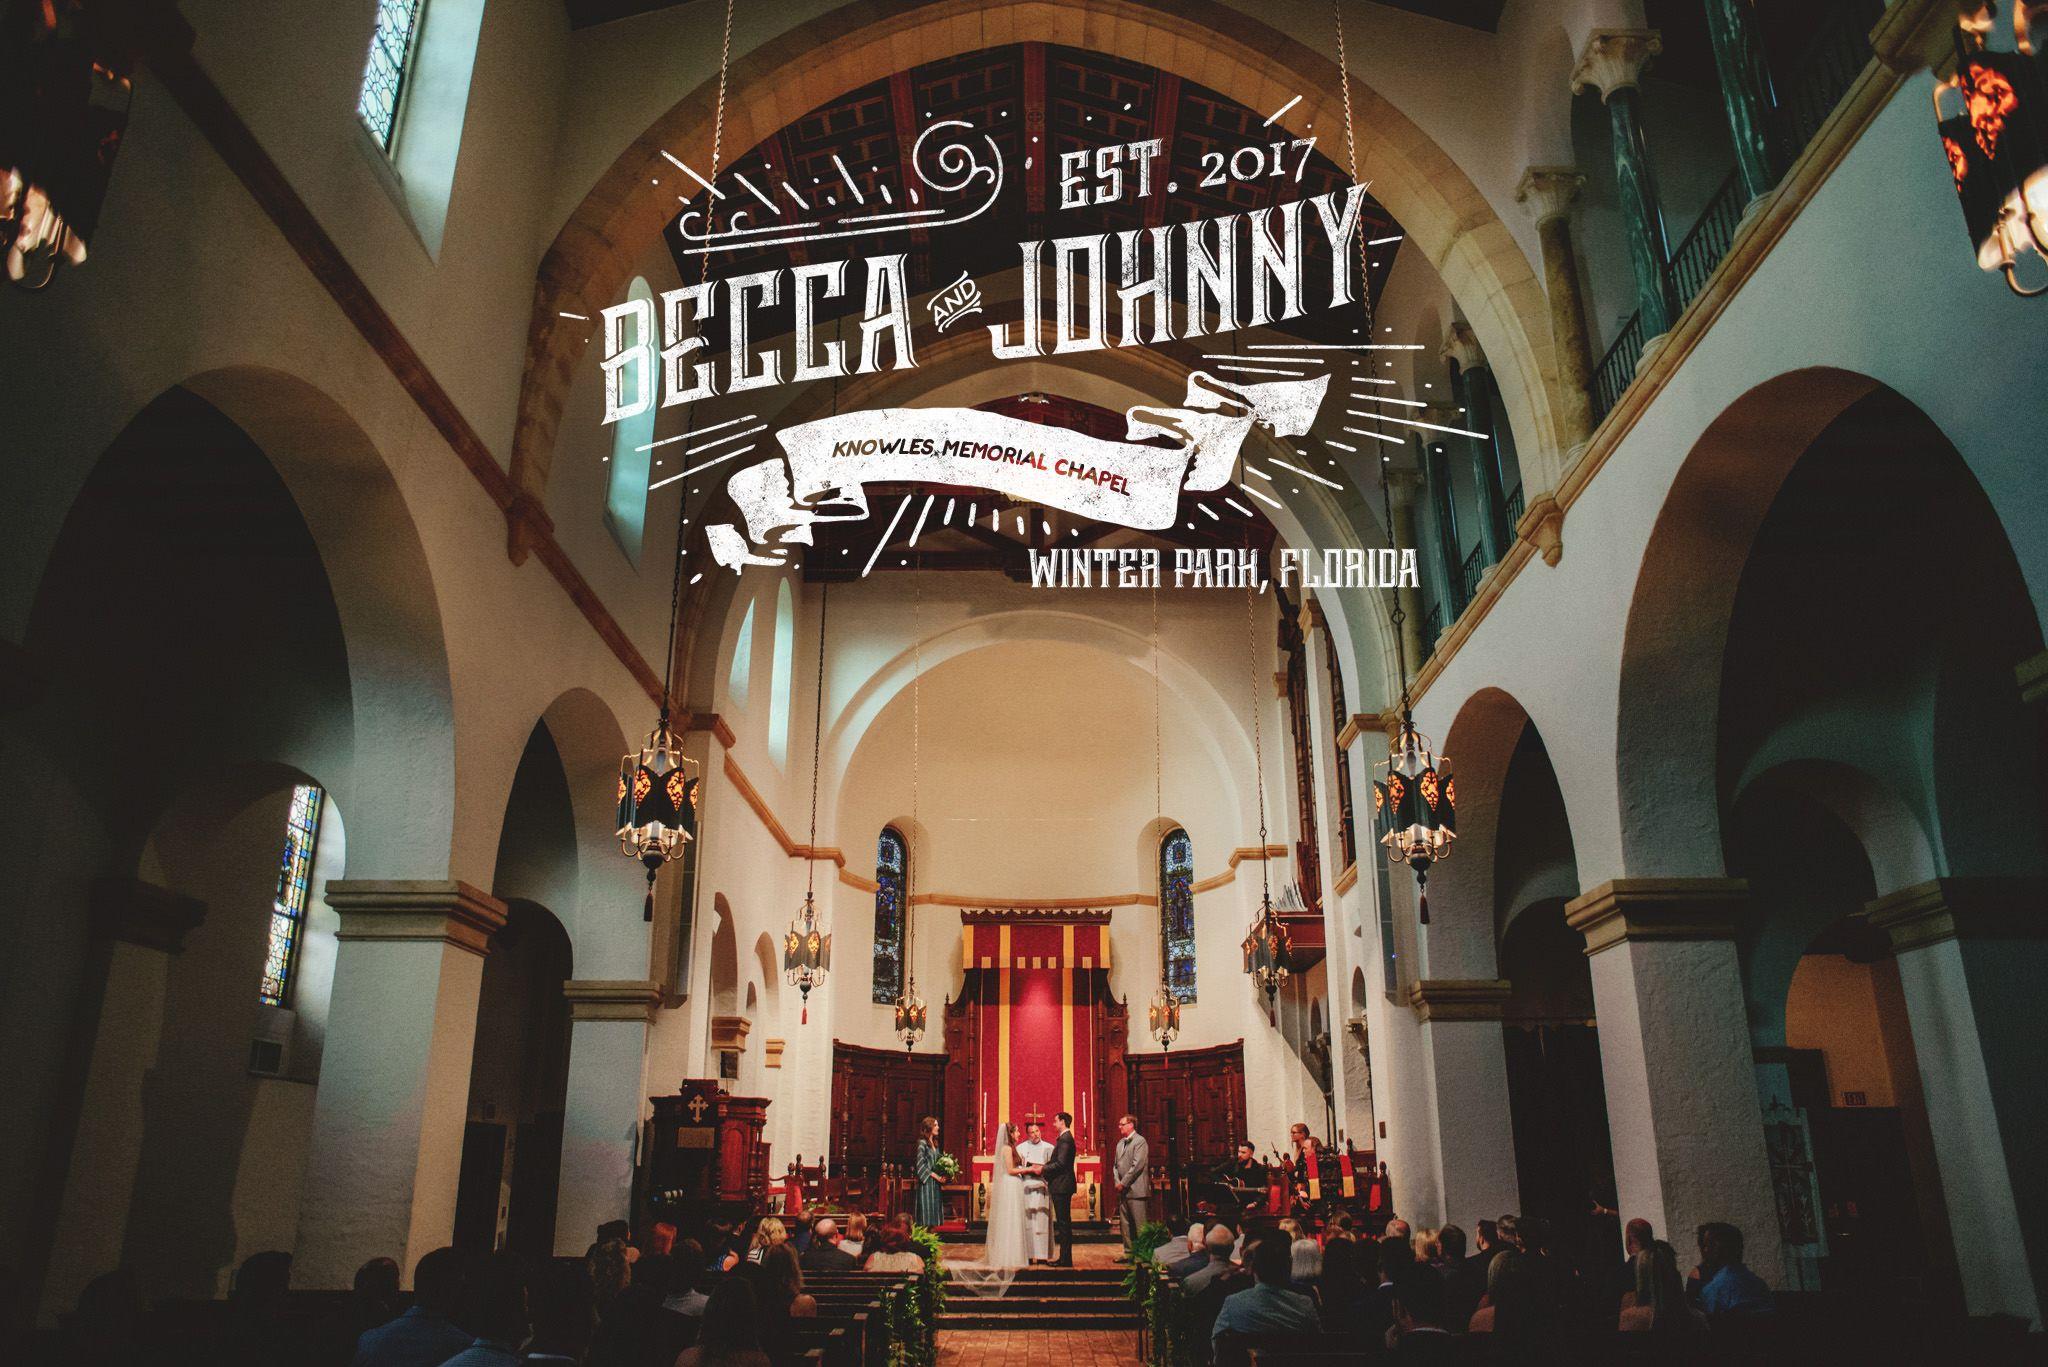 Becca Johnny Orlando Wedding Chapel Wedding